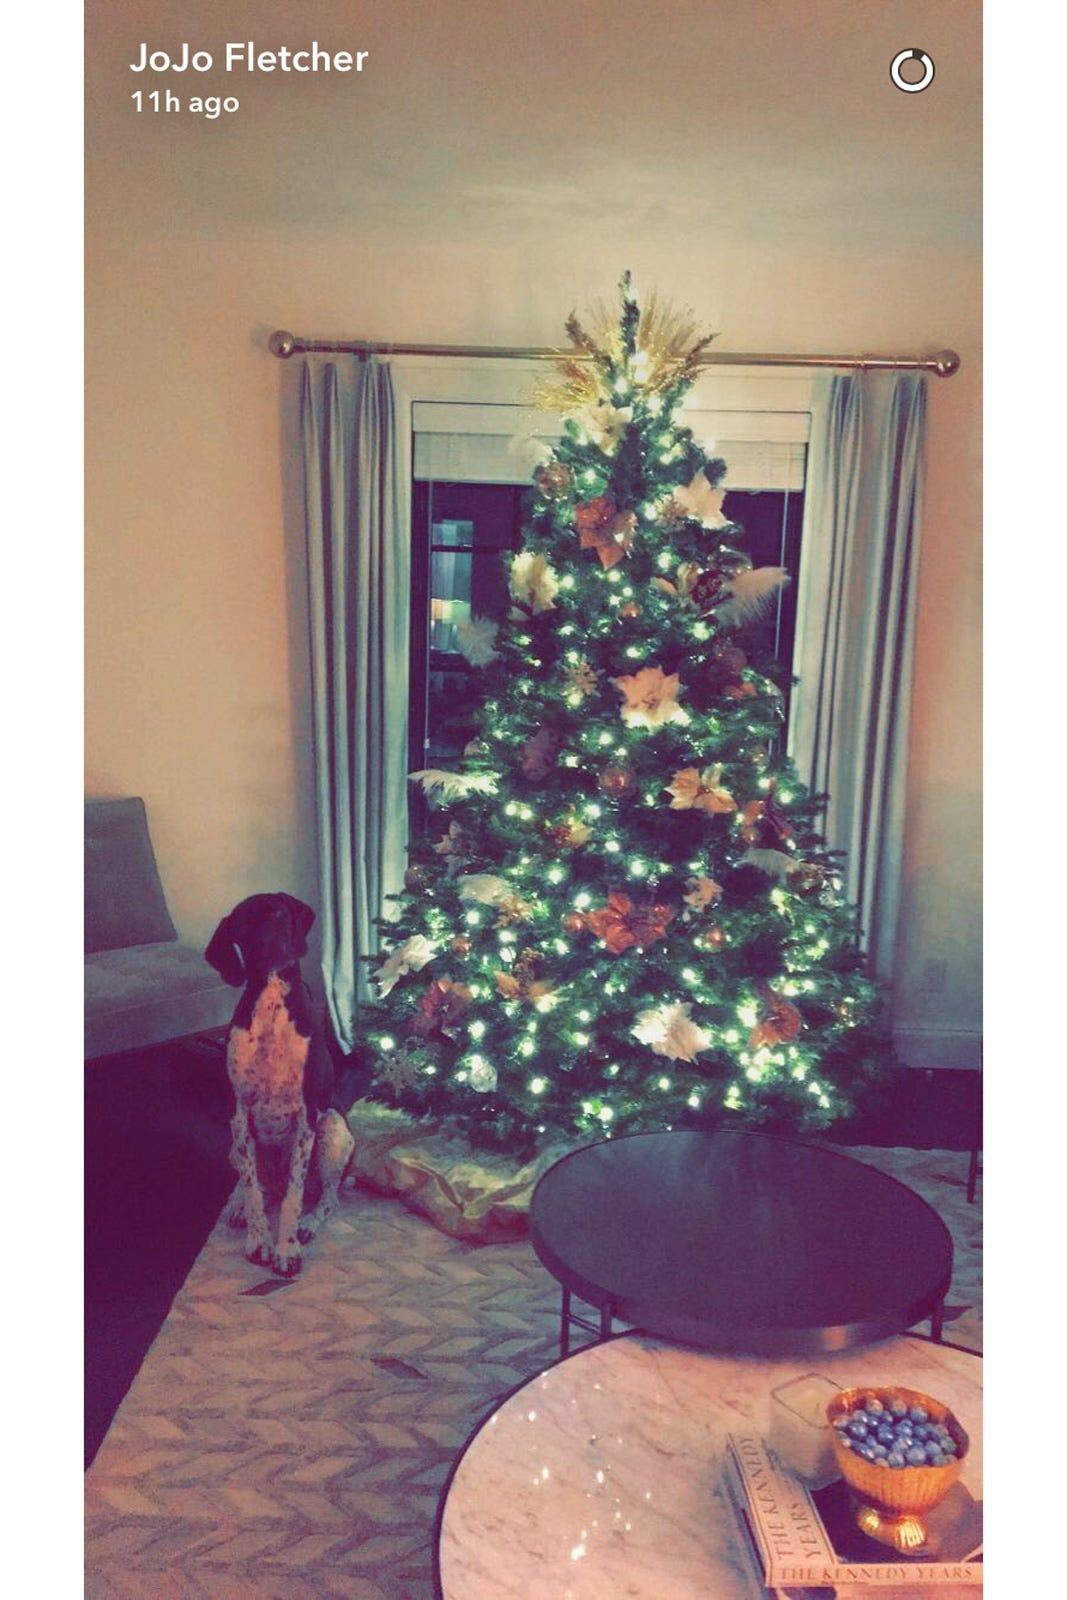 Jojo Fletcher Jordan Rodgers The Bachelorette Christmas